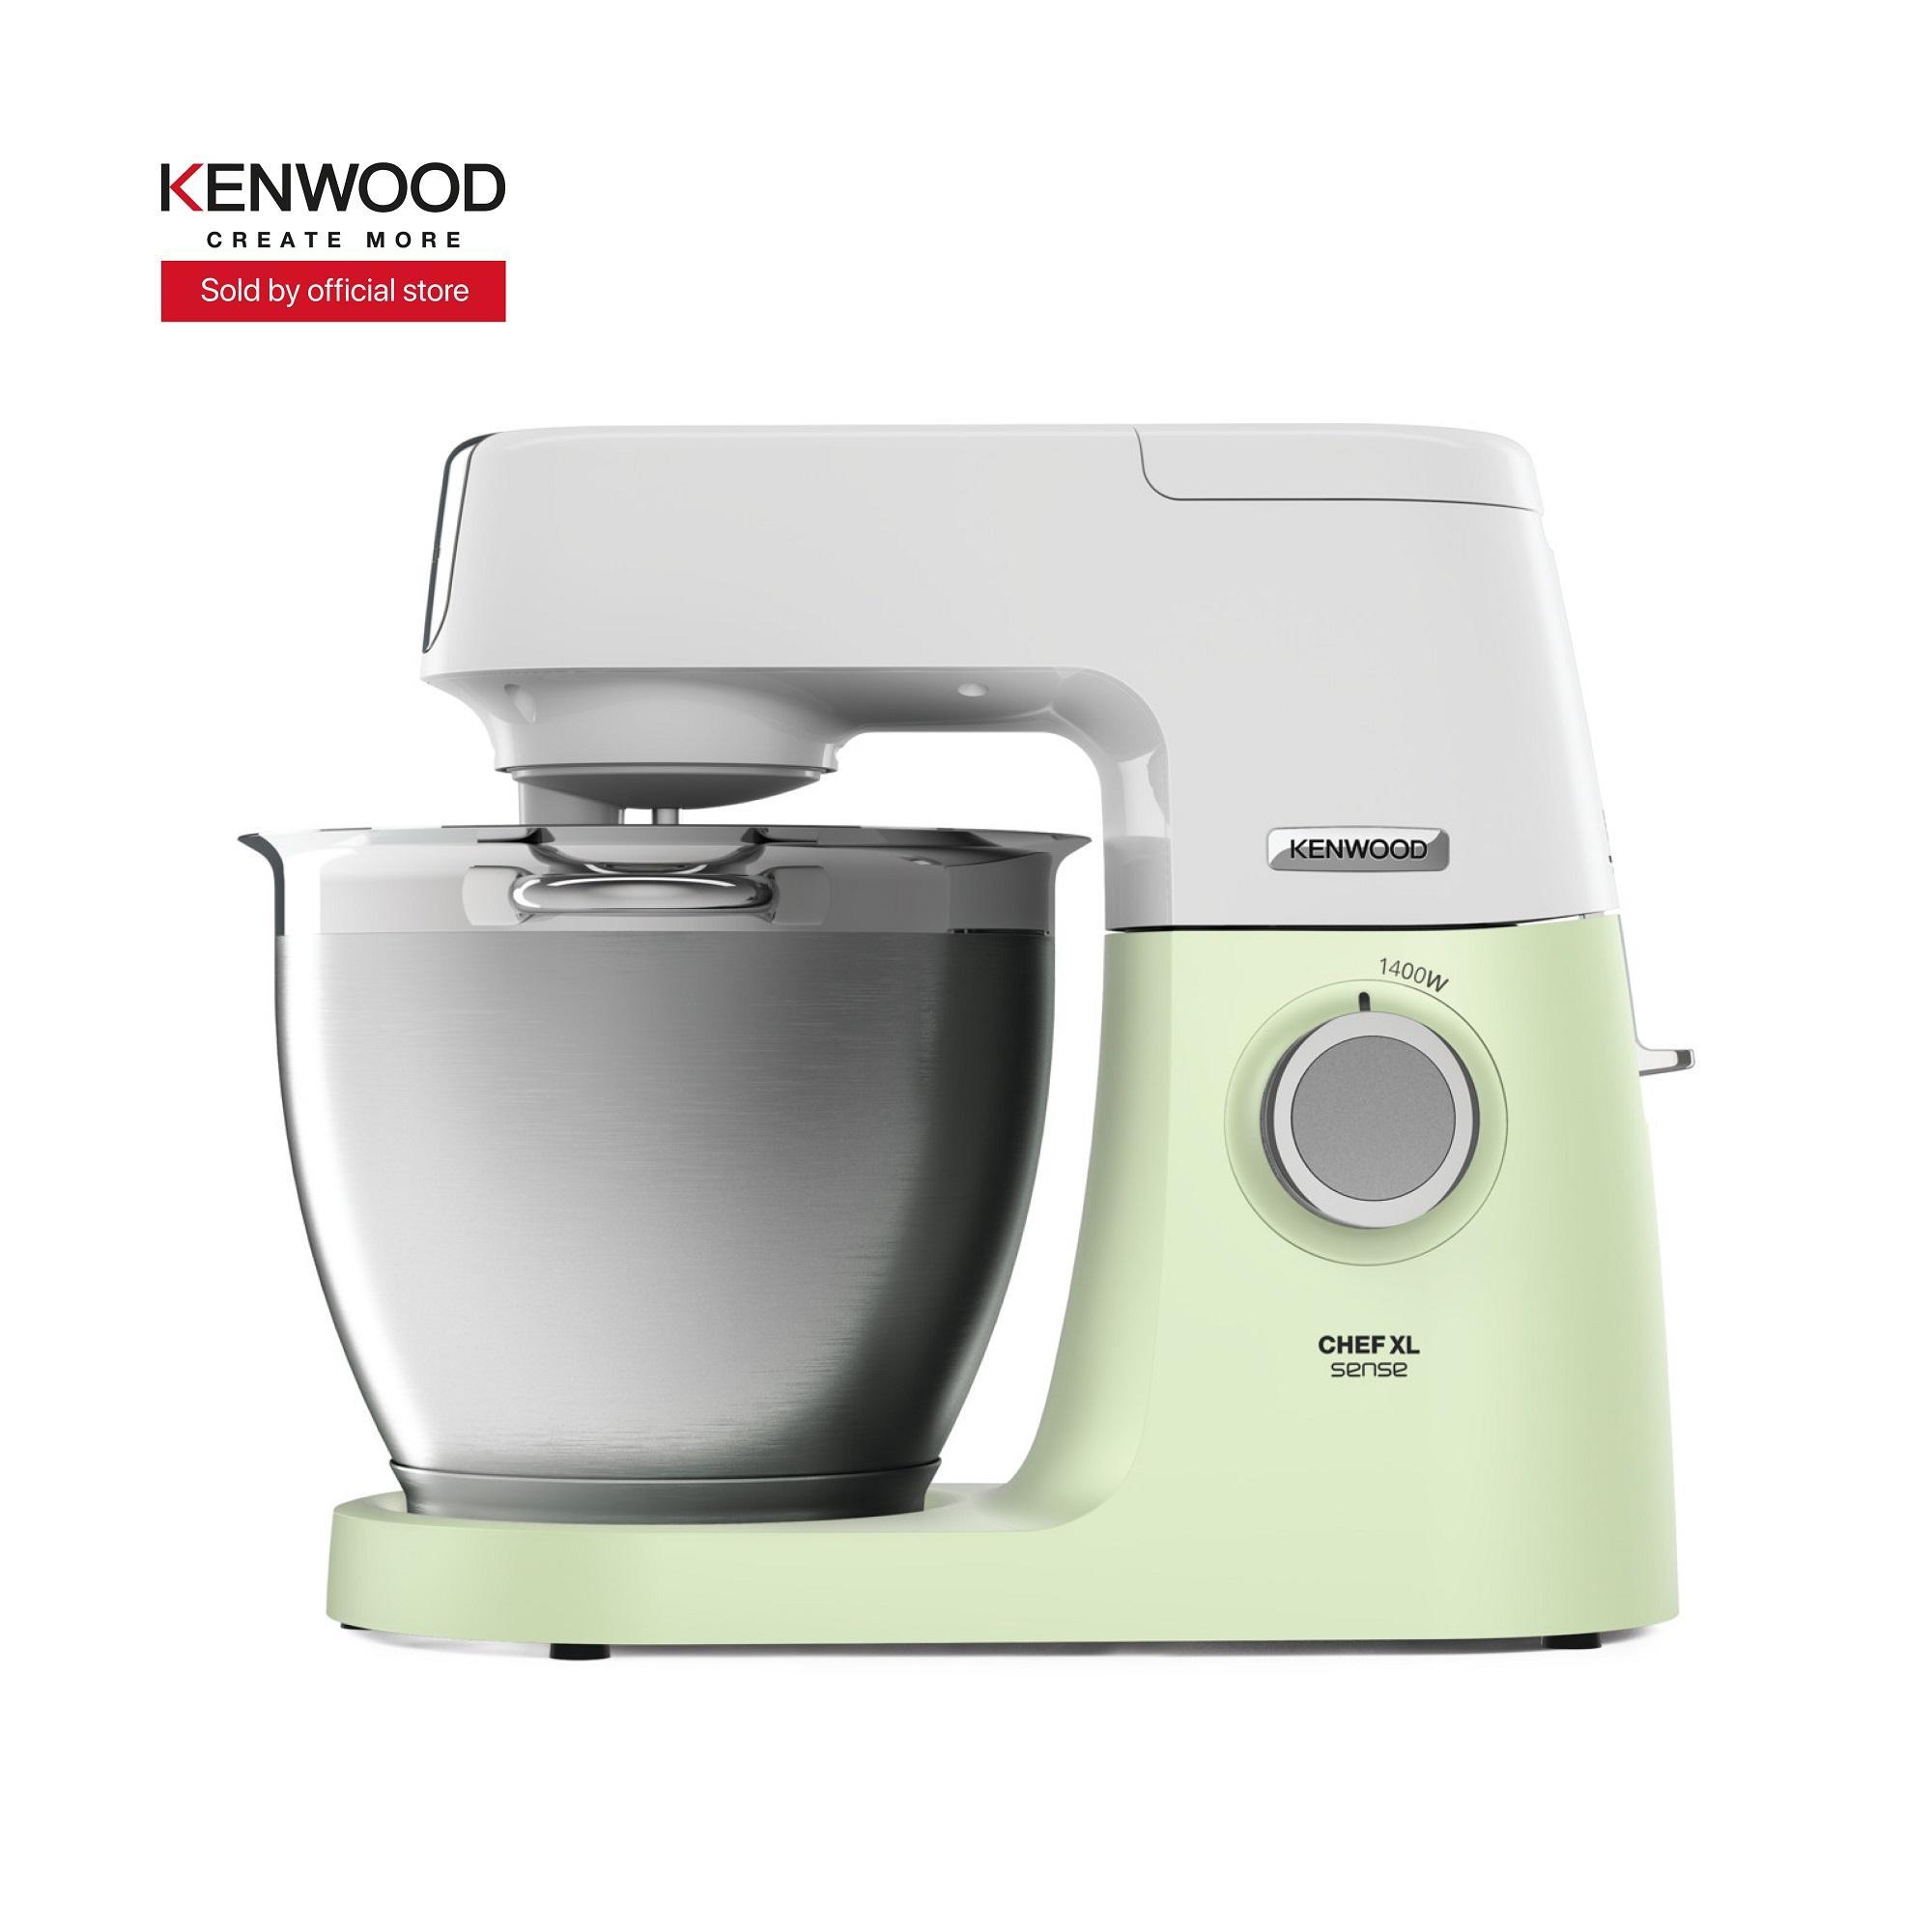 Mixer Comp Philips Hr155940 Green Daftar Harga Terbaru Cnc Breadboard Syb 170 Mini Solderless 170p Putih Kenwood Chef Xl Sense Kitchen Machine 1400w Kvl6100g